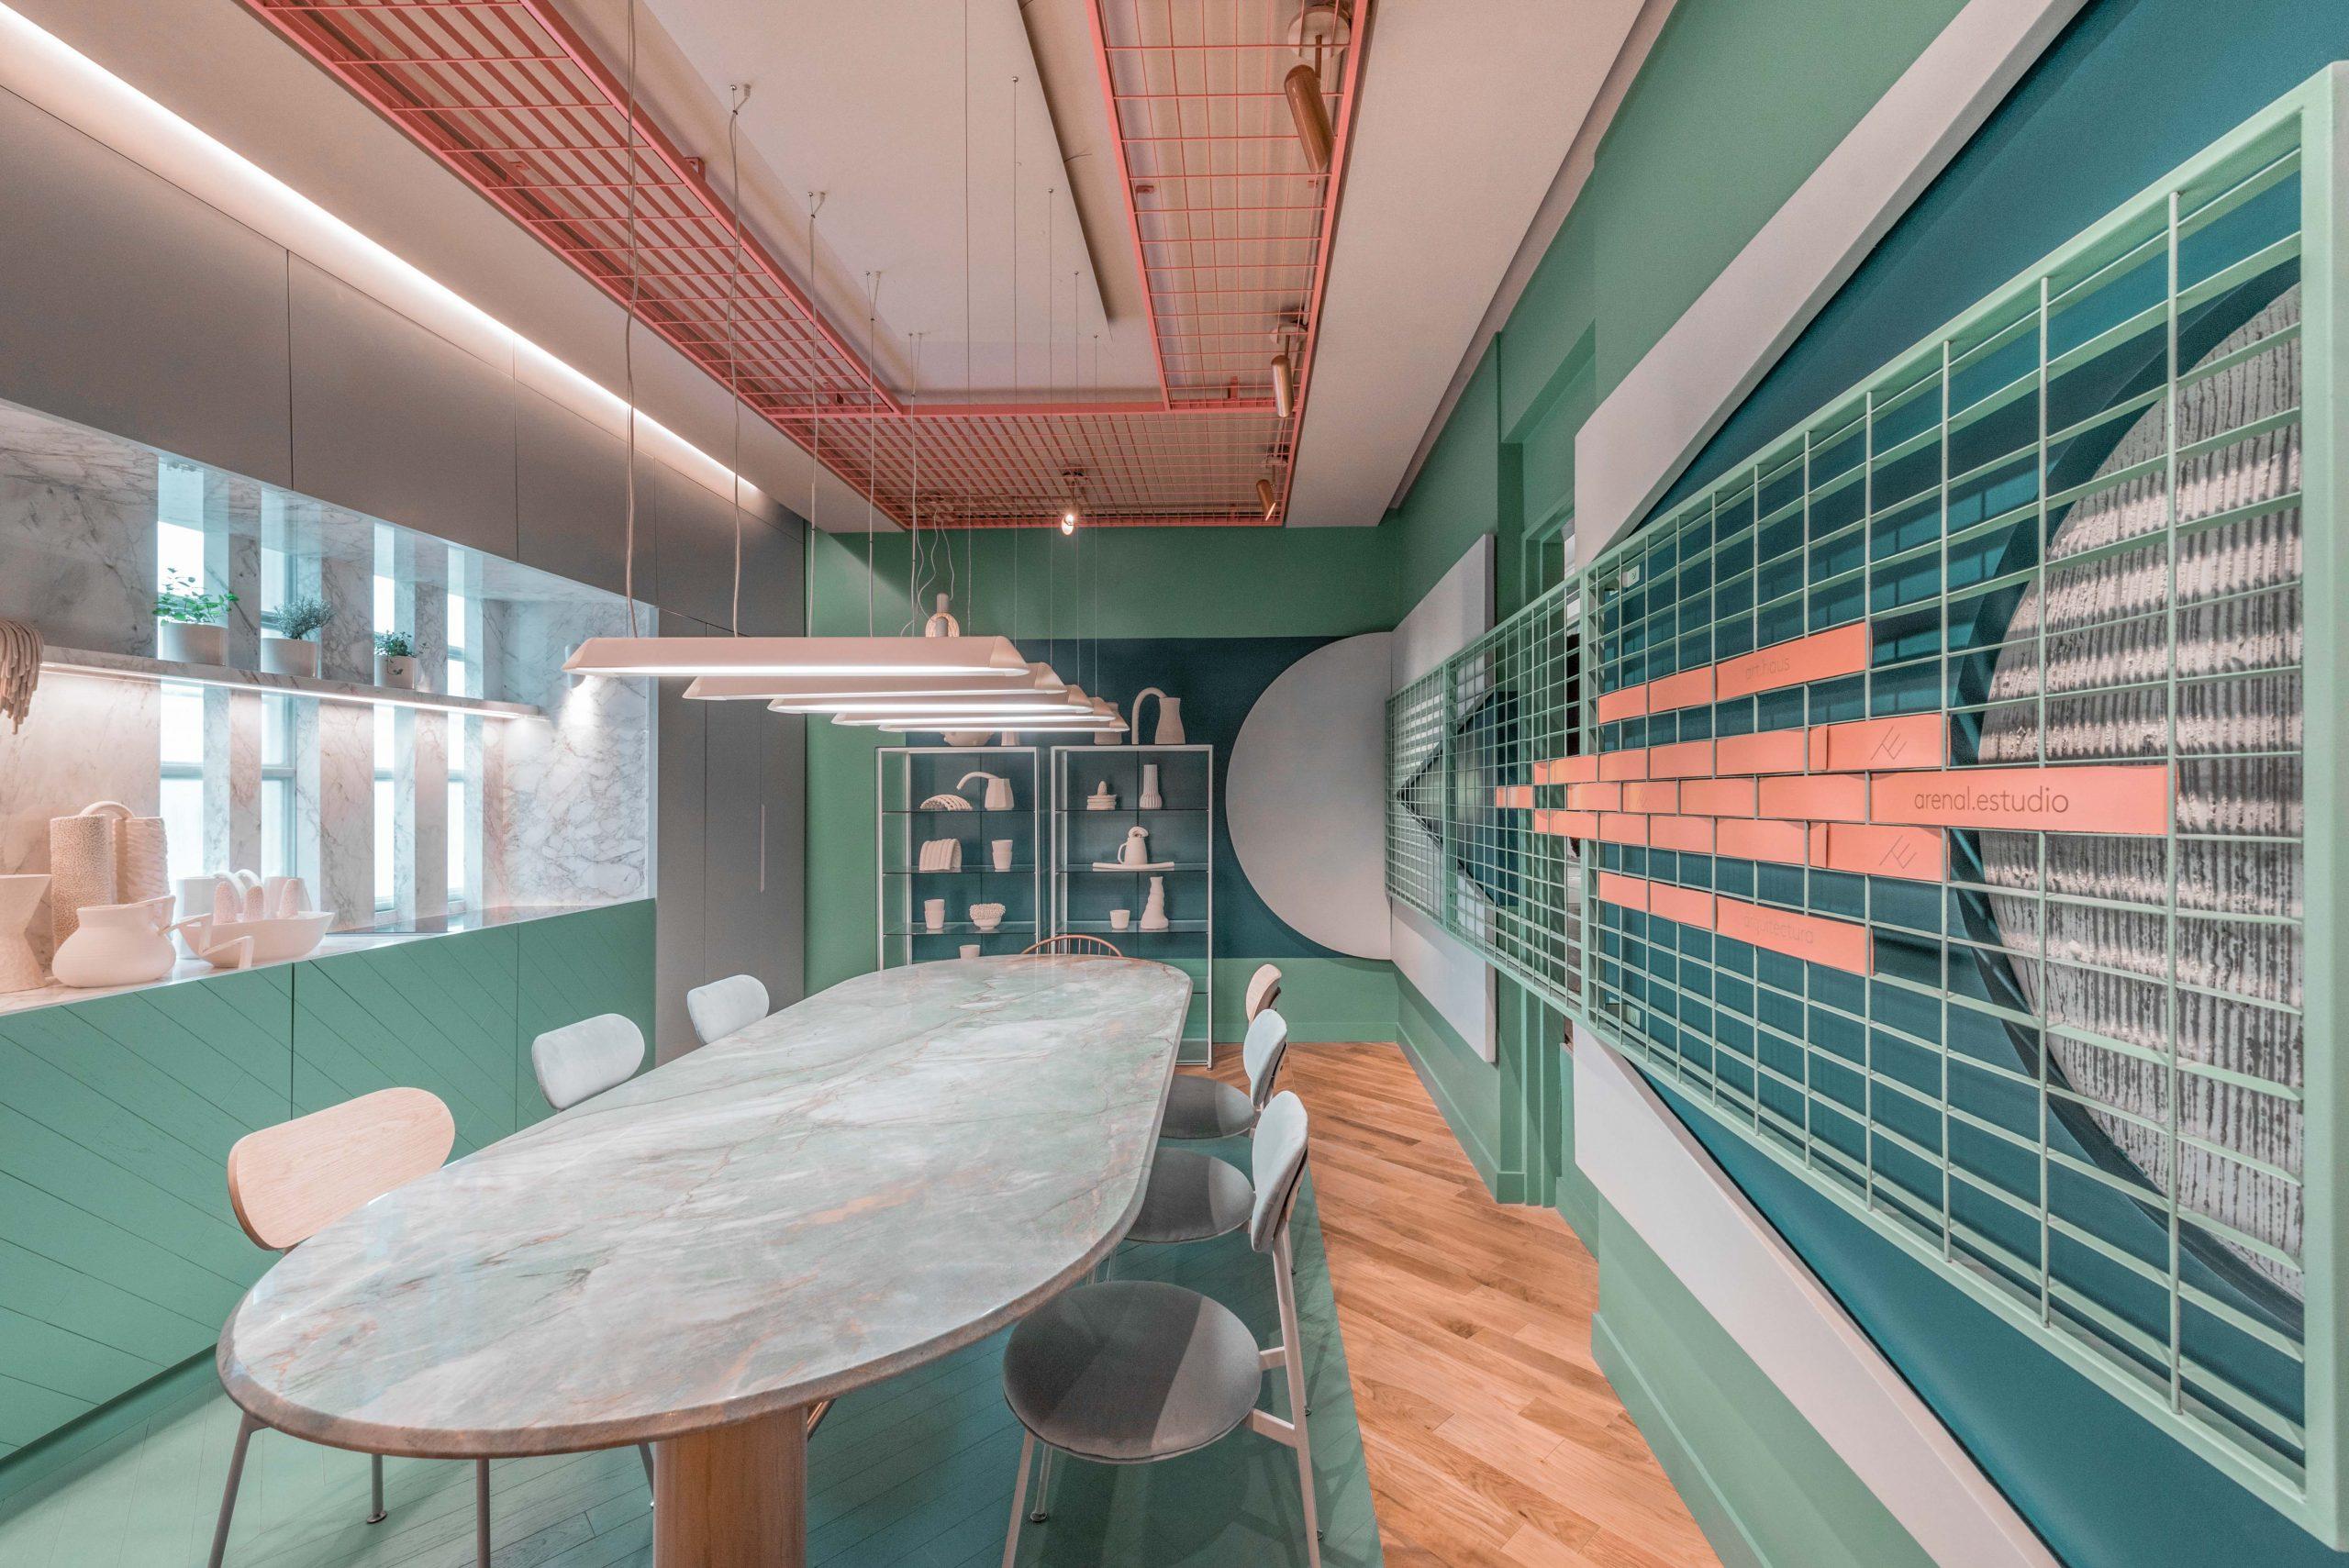 ART HAUS, interior space at Casa FOA.